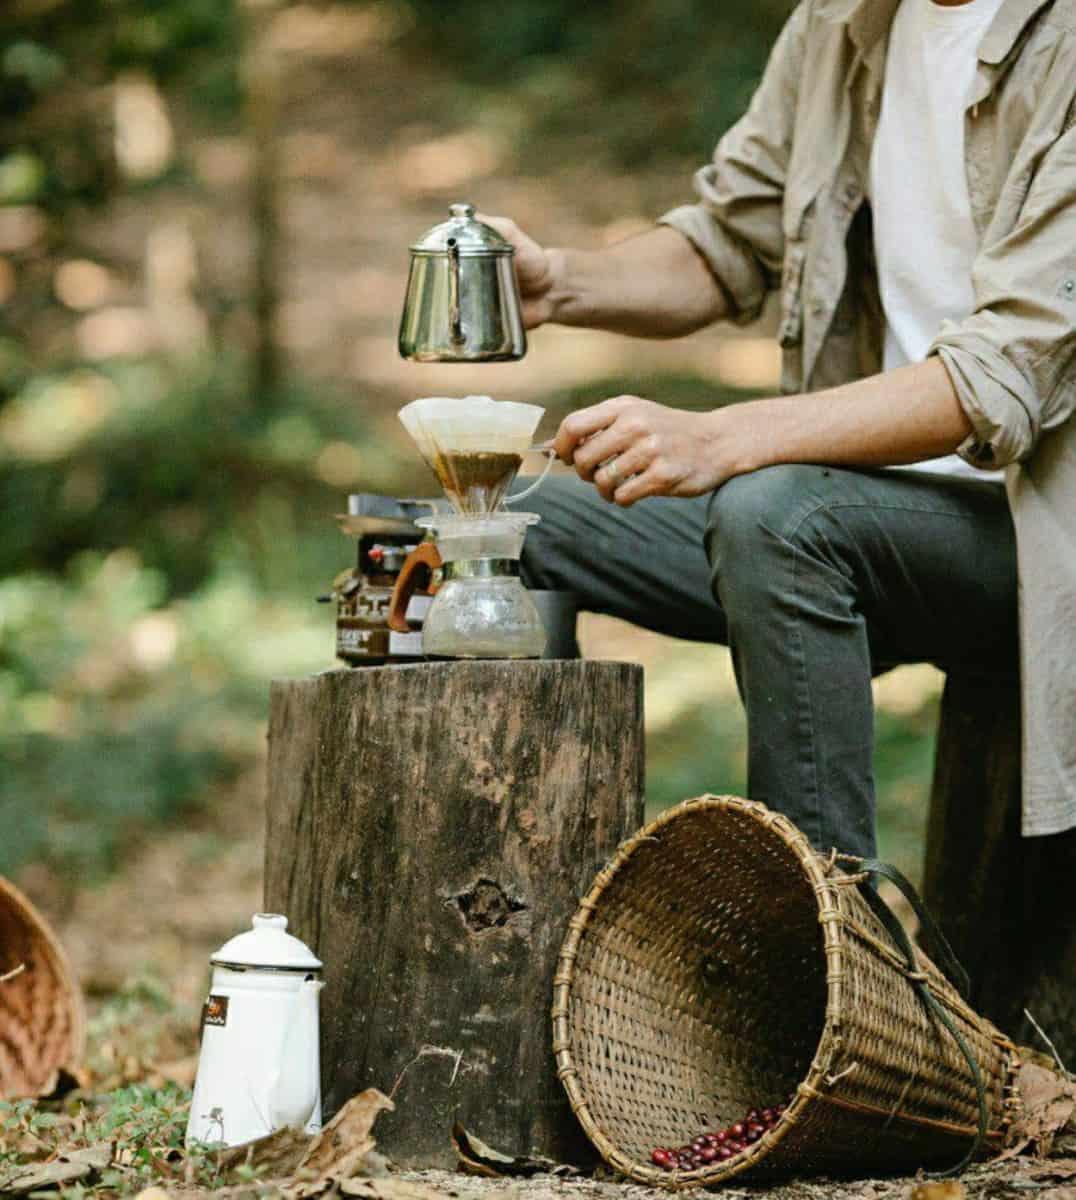 Brewing Sidama coffee the traditional way